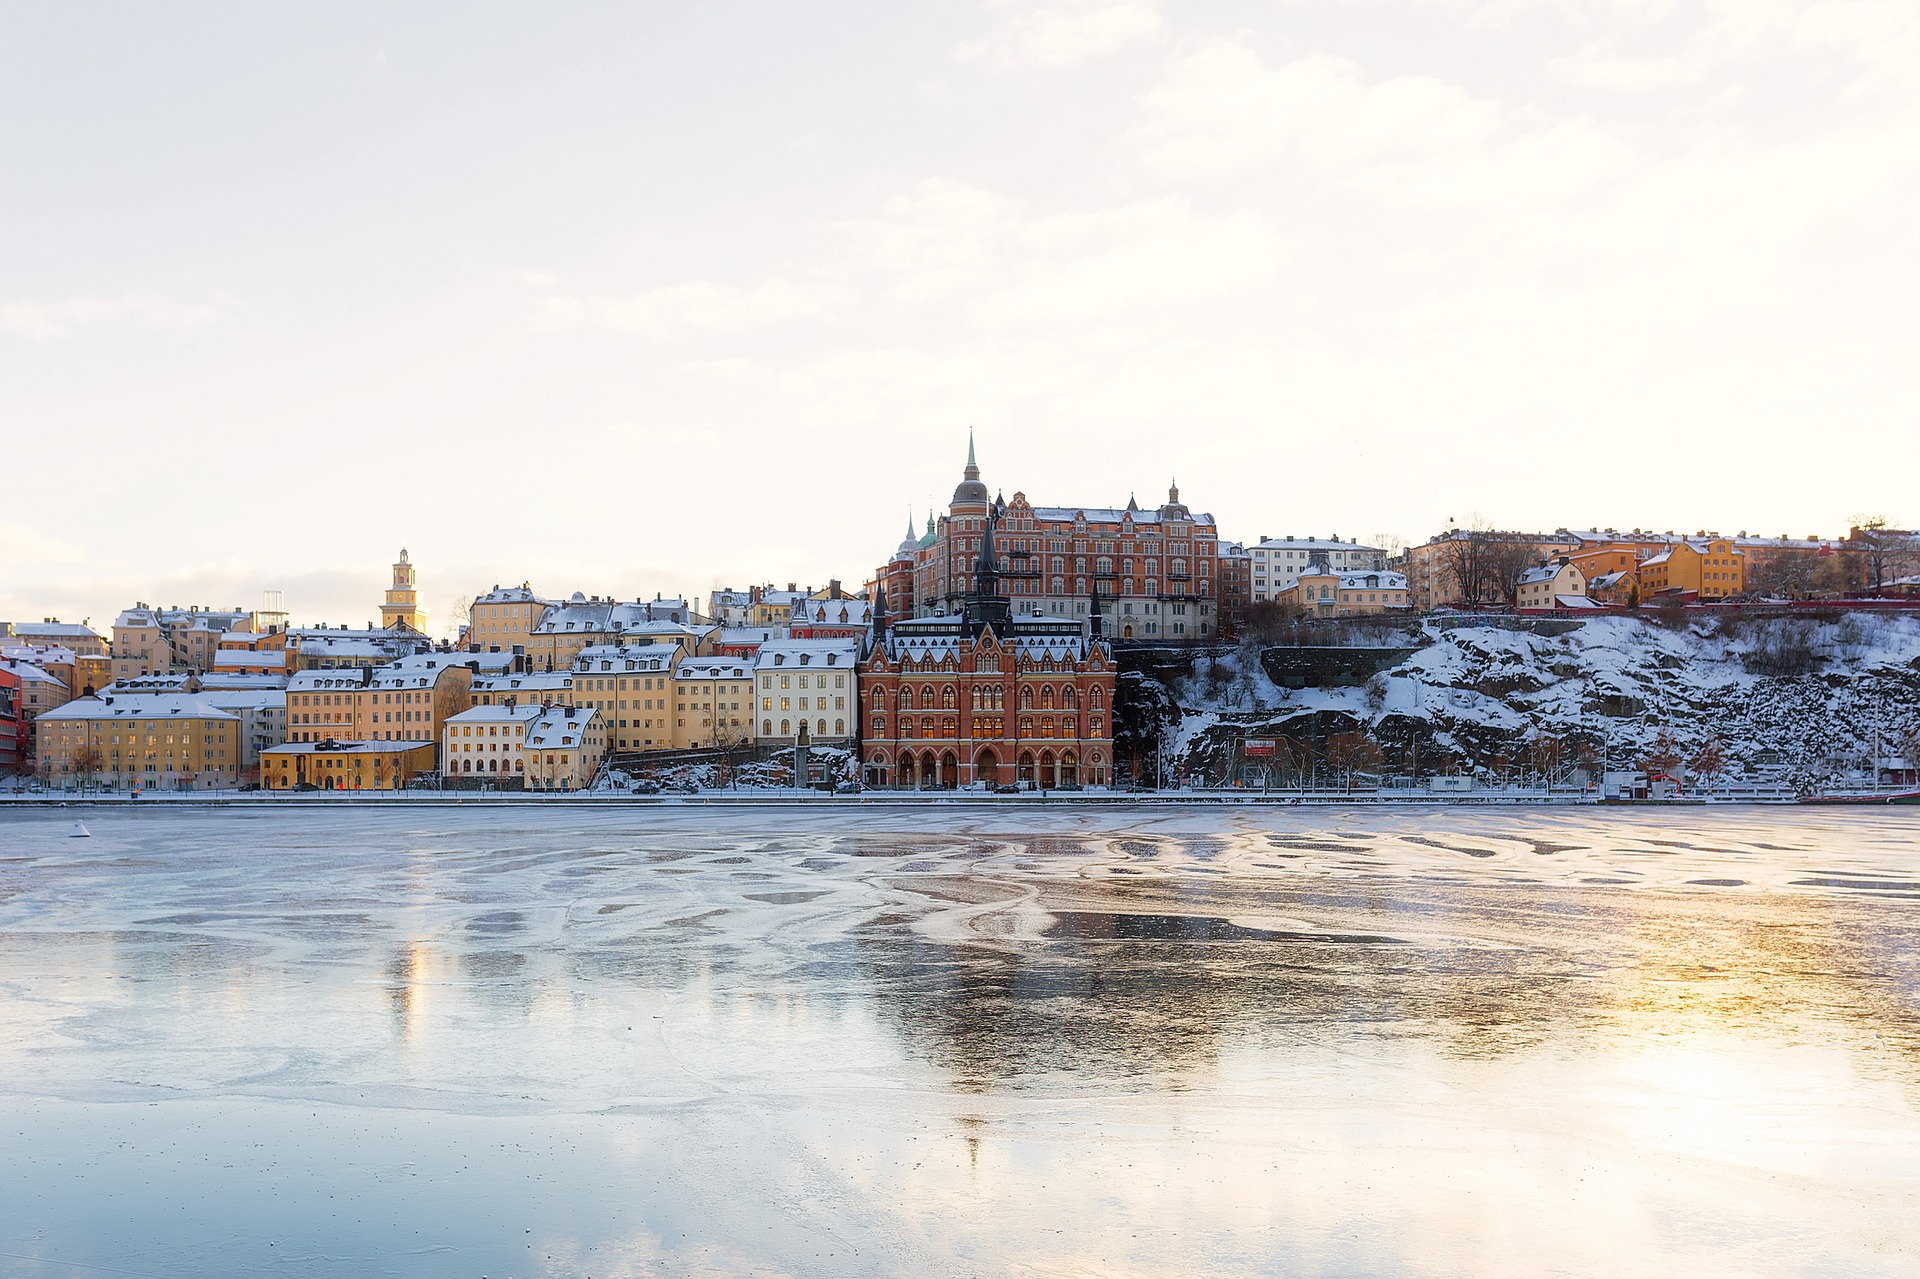 stockholm-1970608_1920.jpg